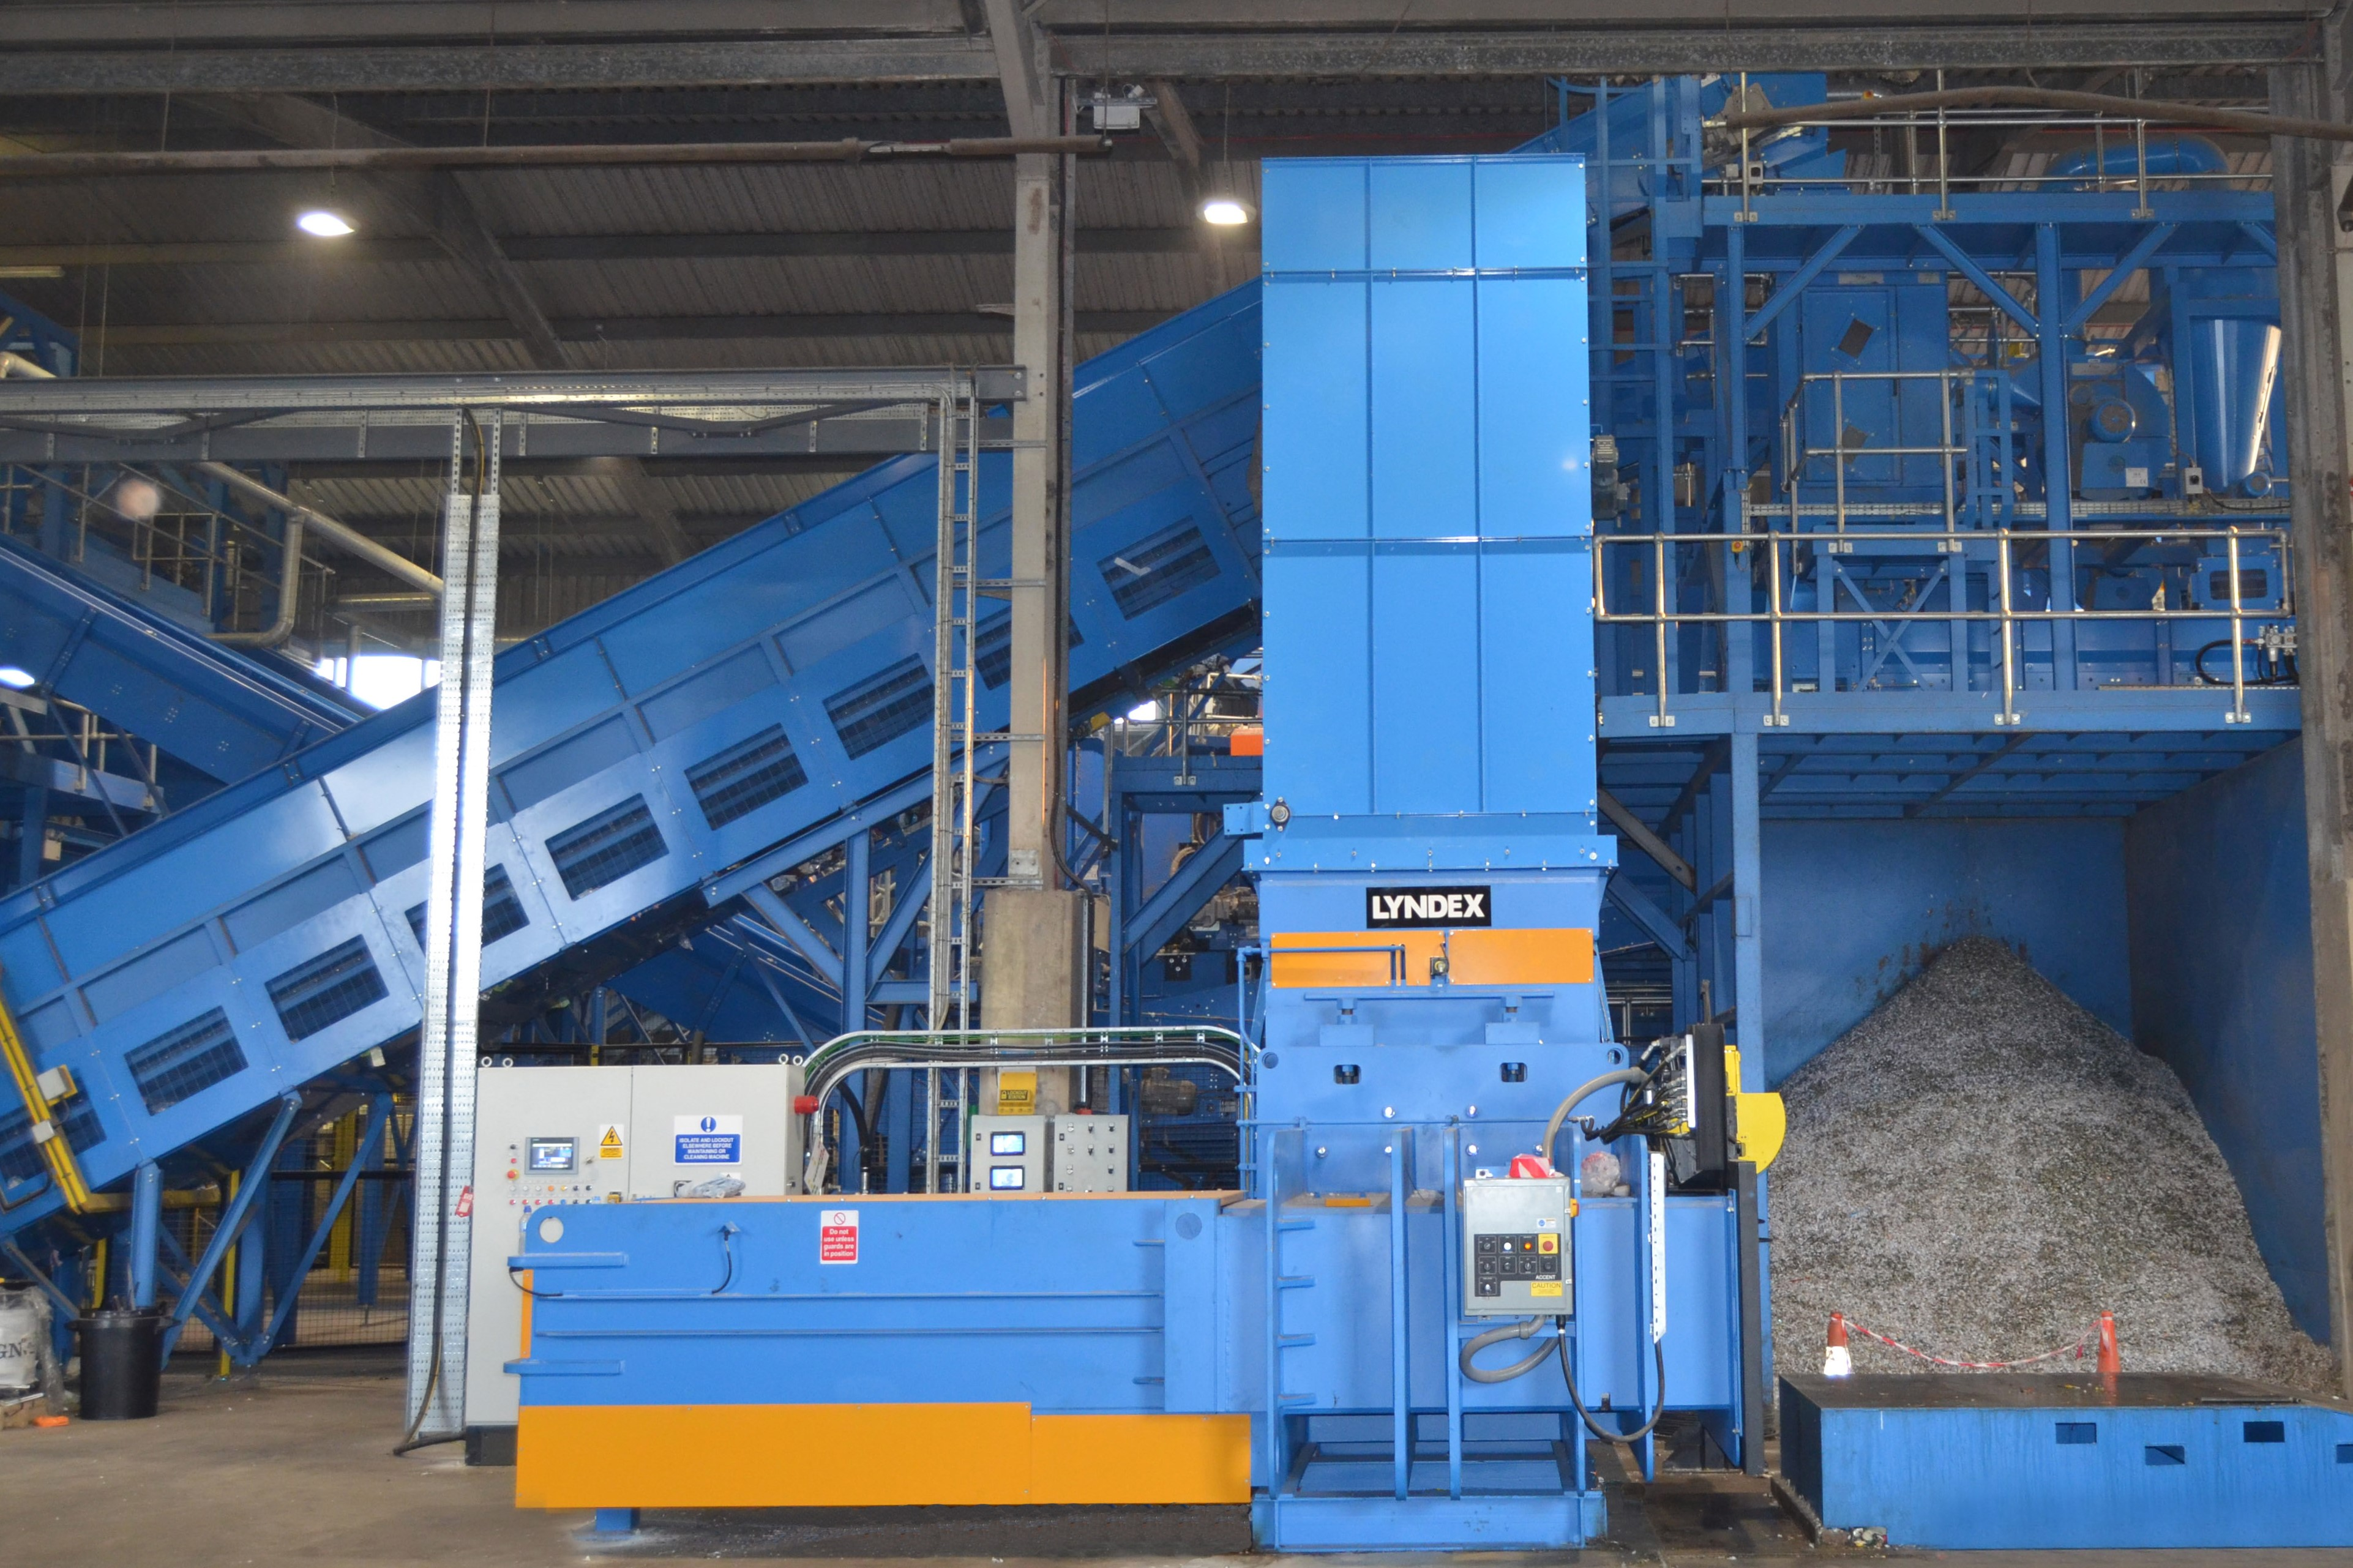 Lyndex Recycling set to raid Munich's IFAT 2018 with Ram II balers